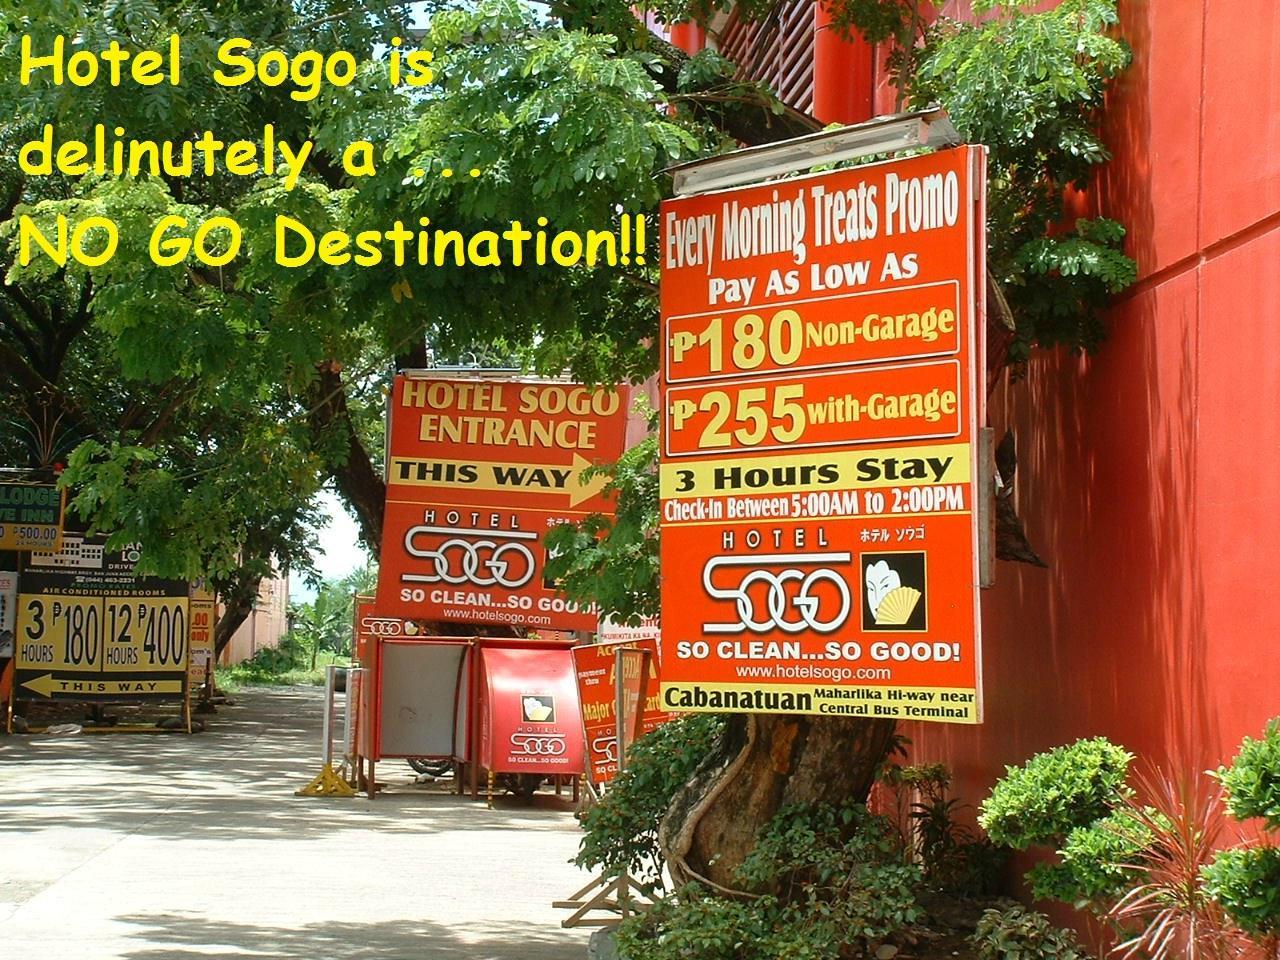 Hotel Sogo Cabanatuan